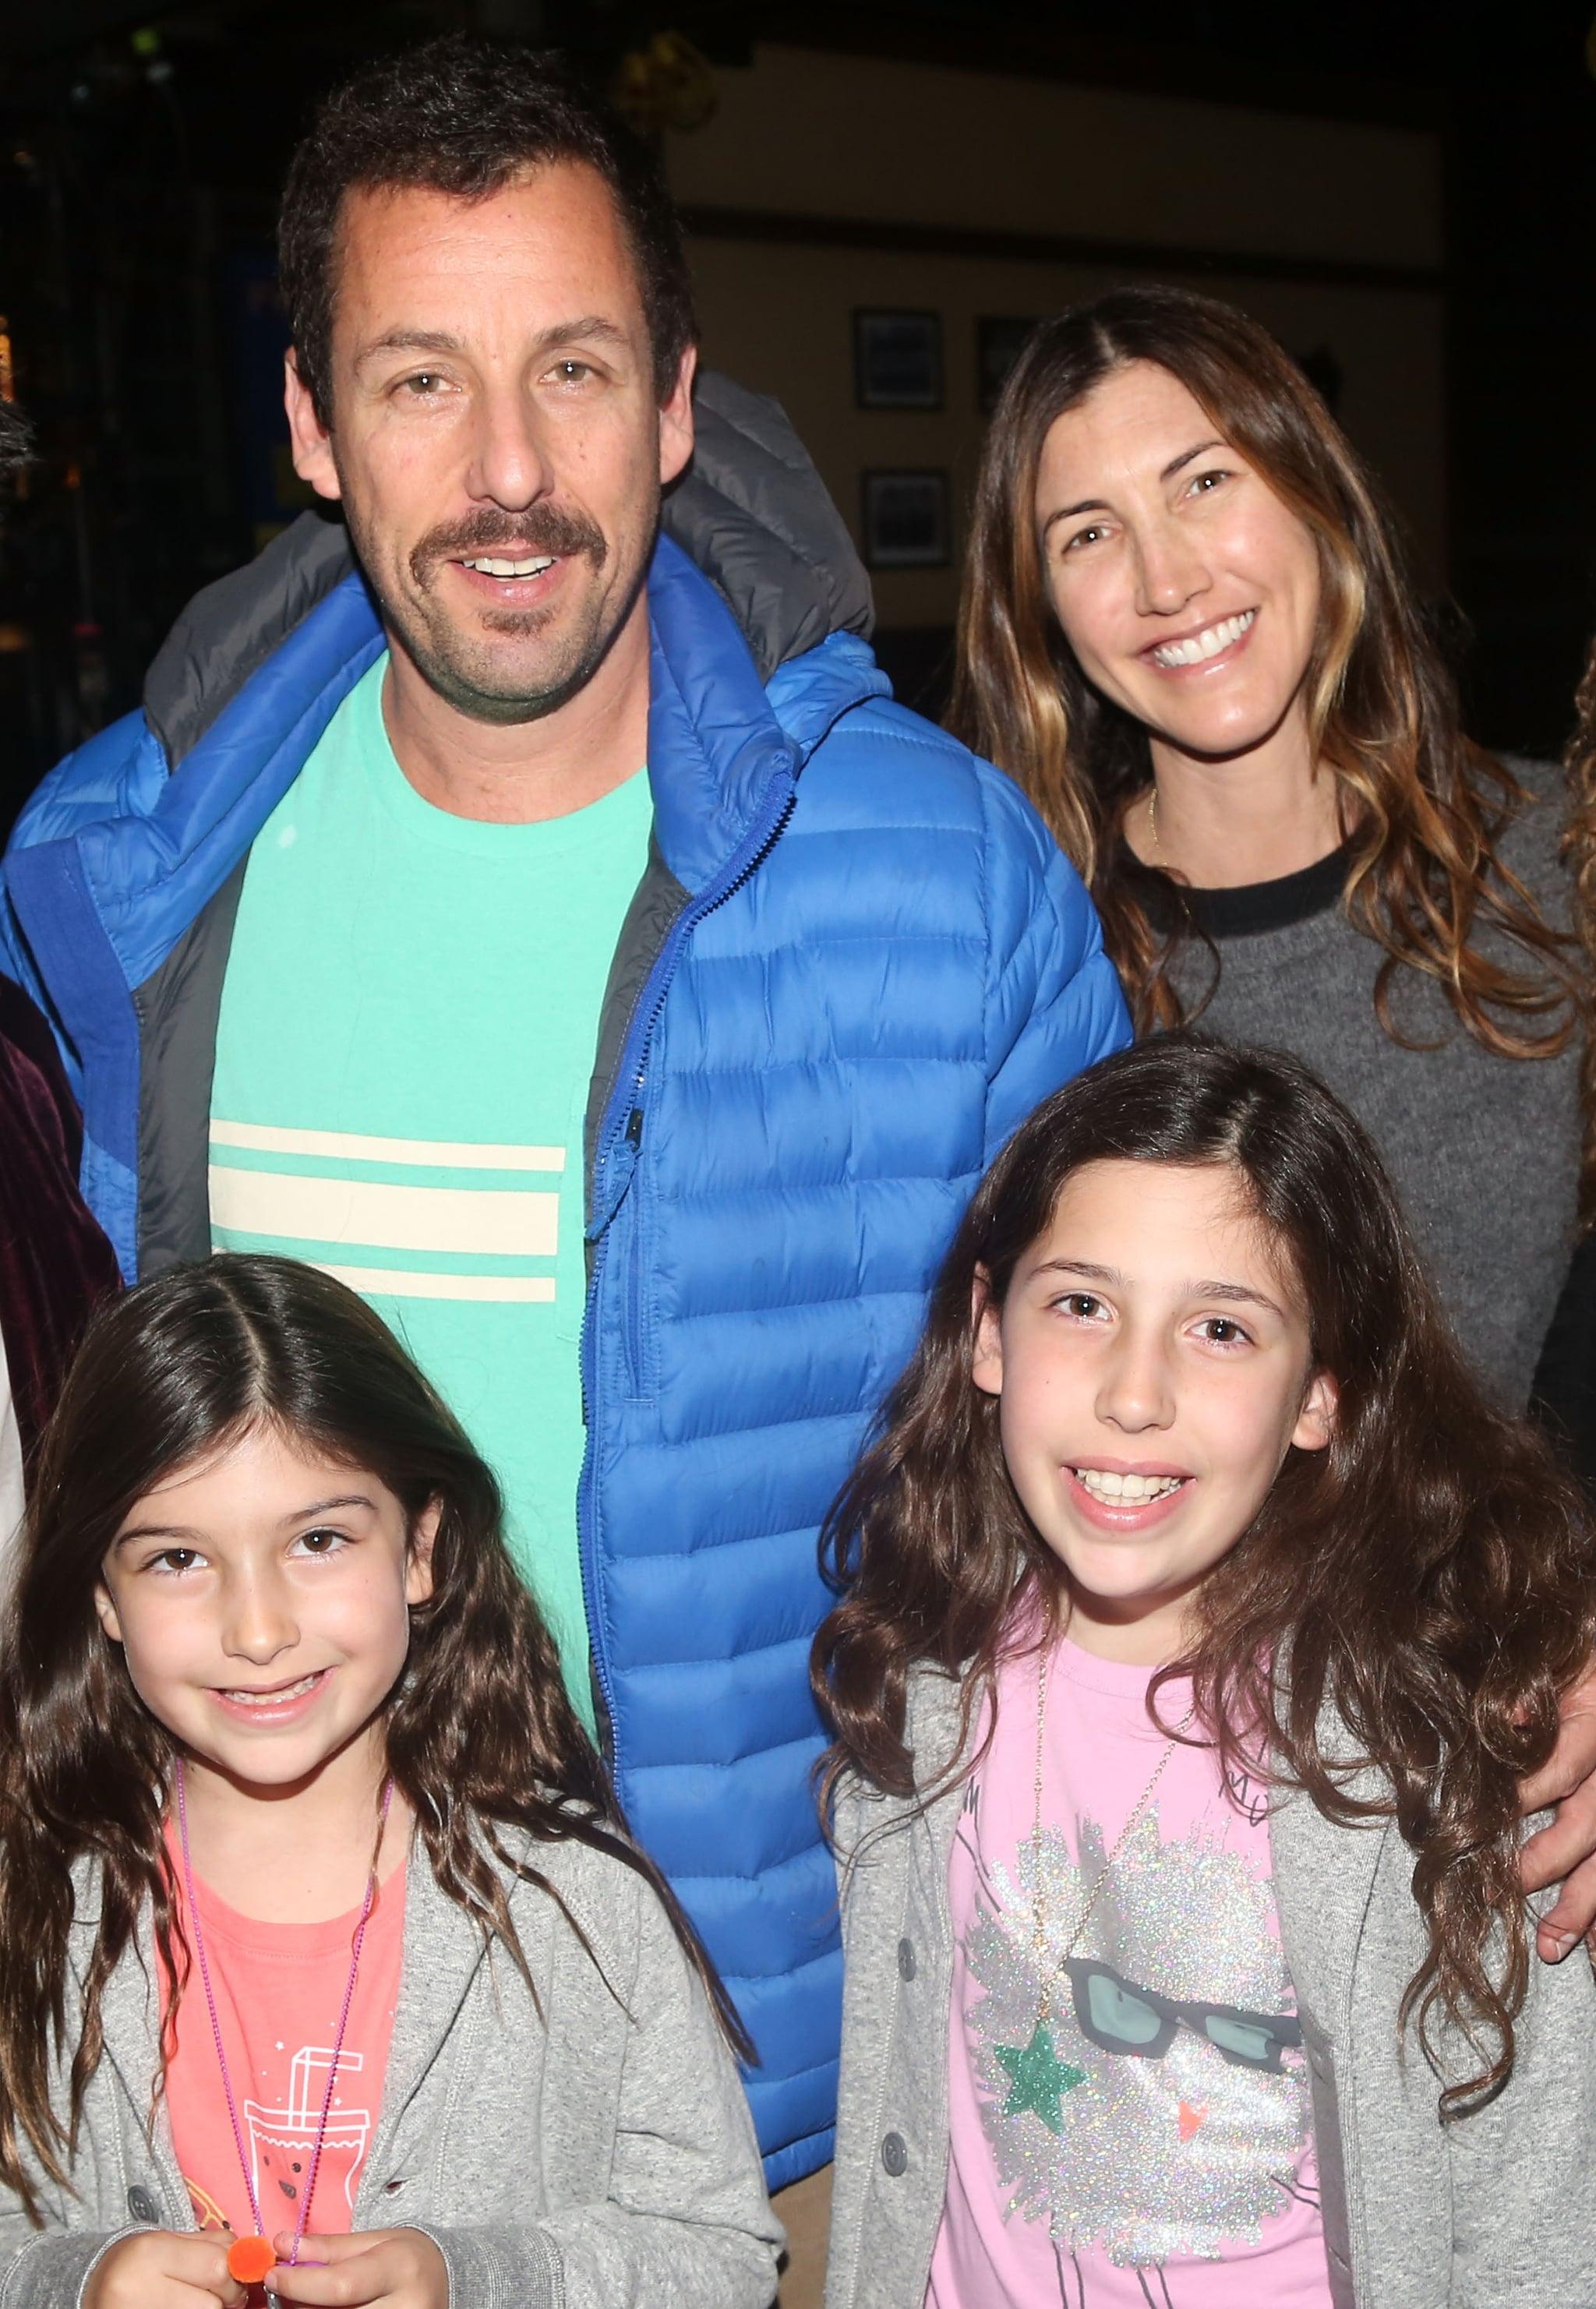 NEW YORK, NY - MARCH 23:  (EXCLUSIVE COVERAGE) (L-R) Sunny Sandler, Adam Sandler, Sadie Sandler and Jackie Sandler pose backstage at the hit musical